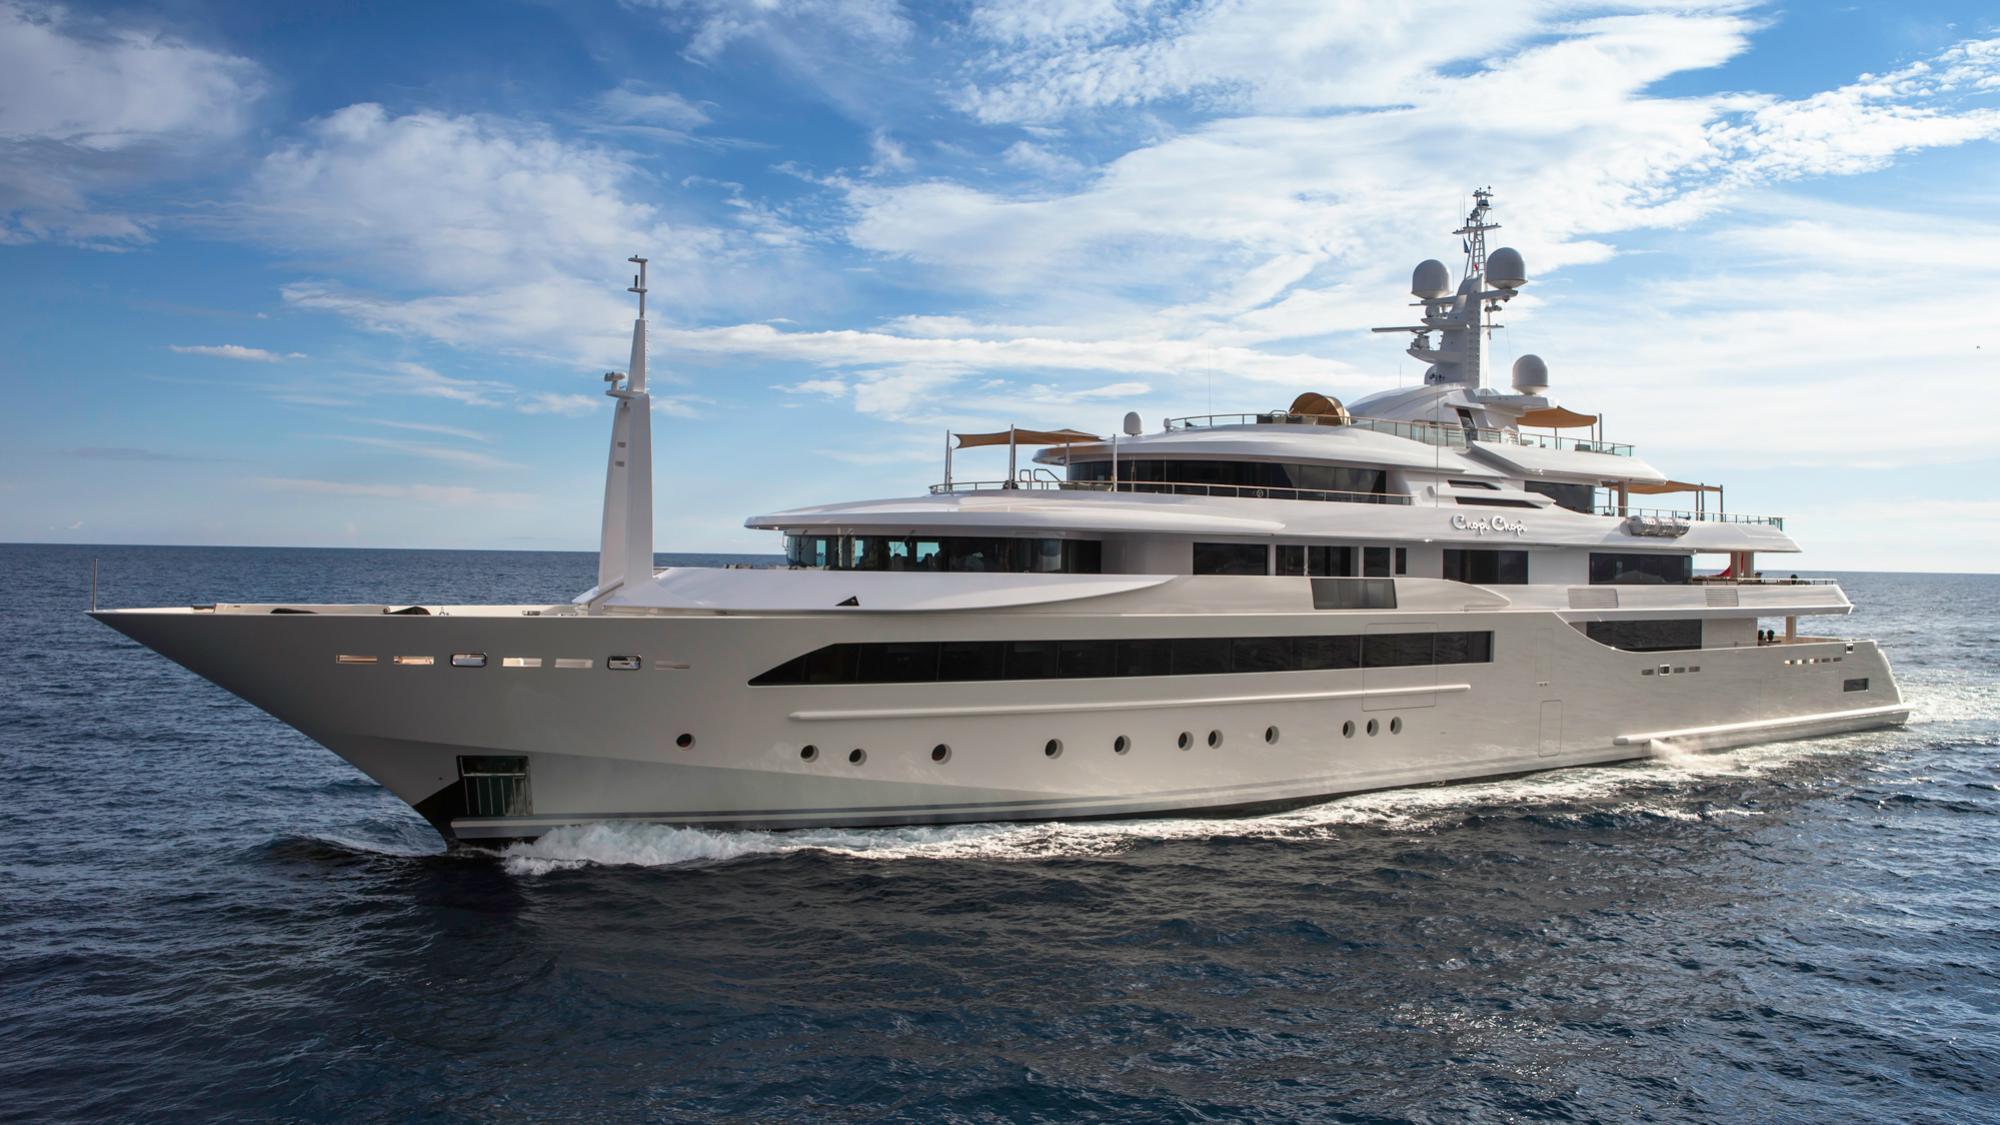 chopi-chopi-motor-yacht-crn-2013-80m-bow